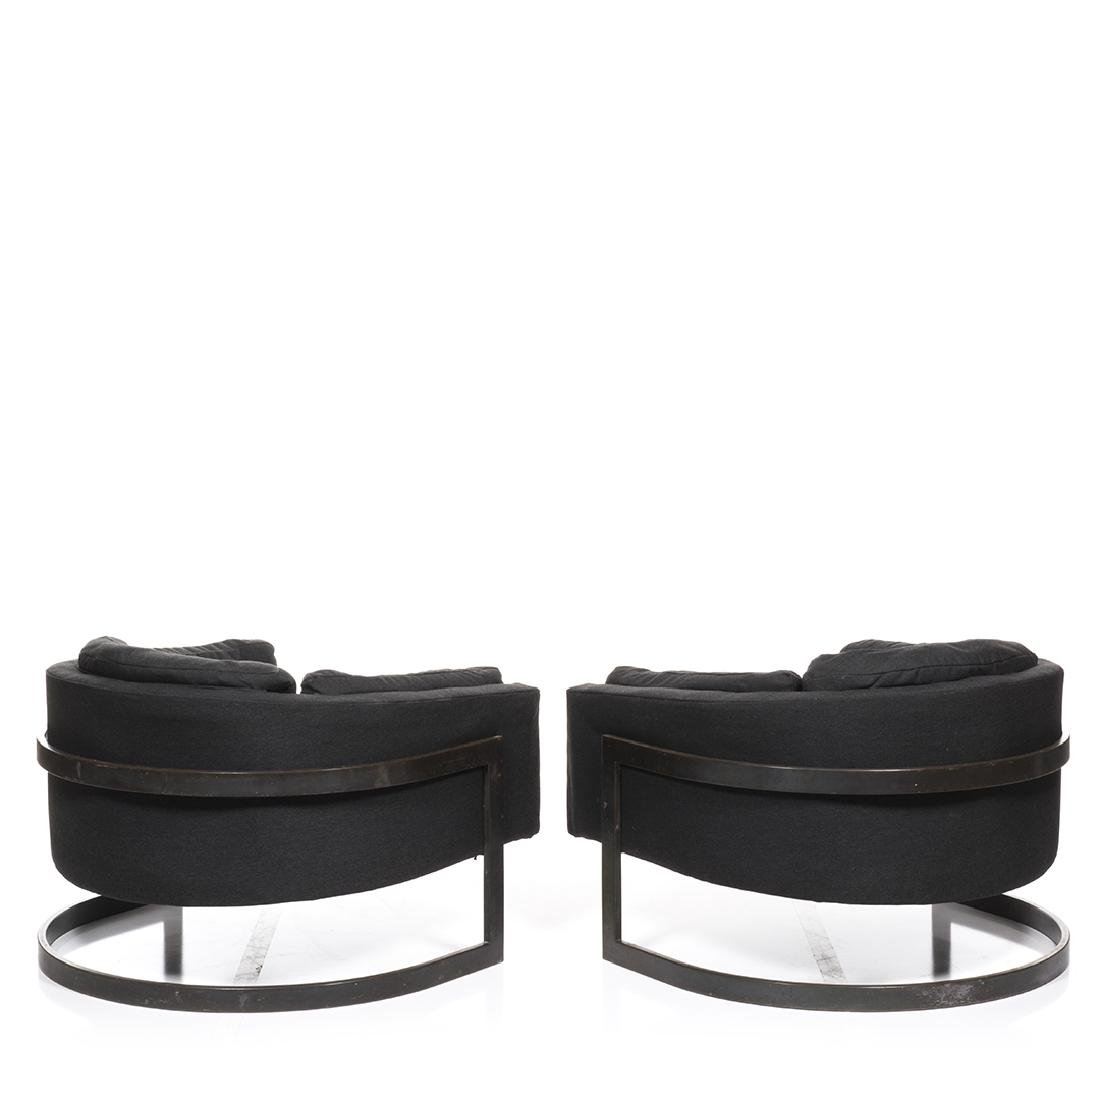 Jules Heumann Bronze Lounge Chairs (2) - 3